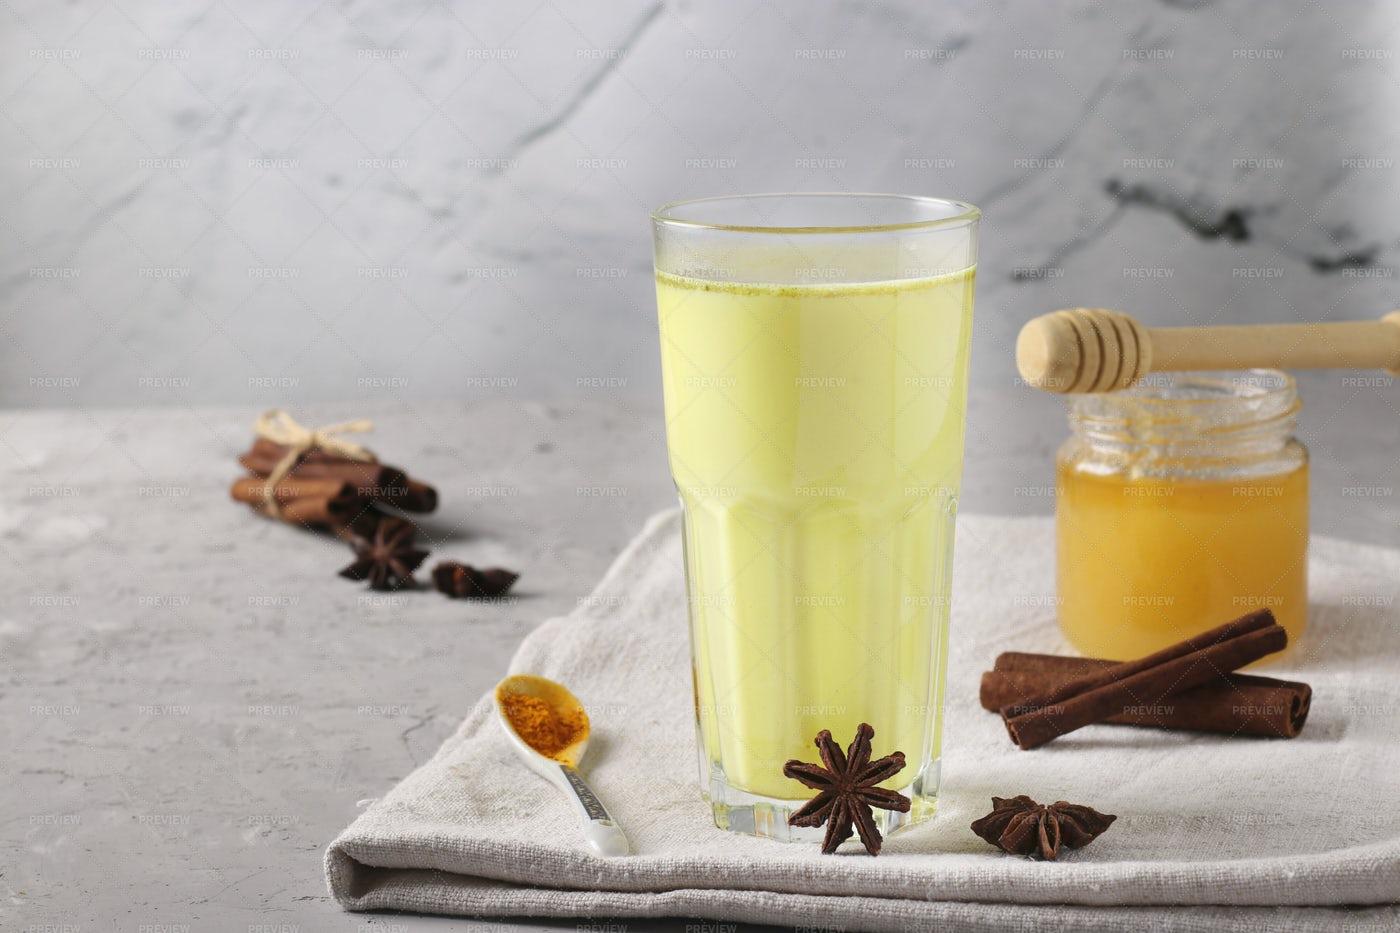 Ayurvedic Golden Milk: Stock Photos